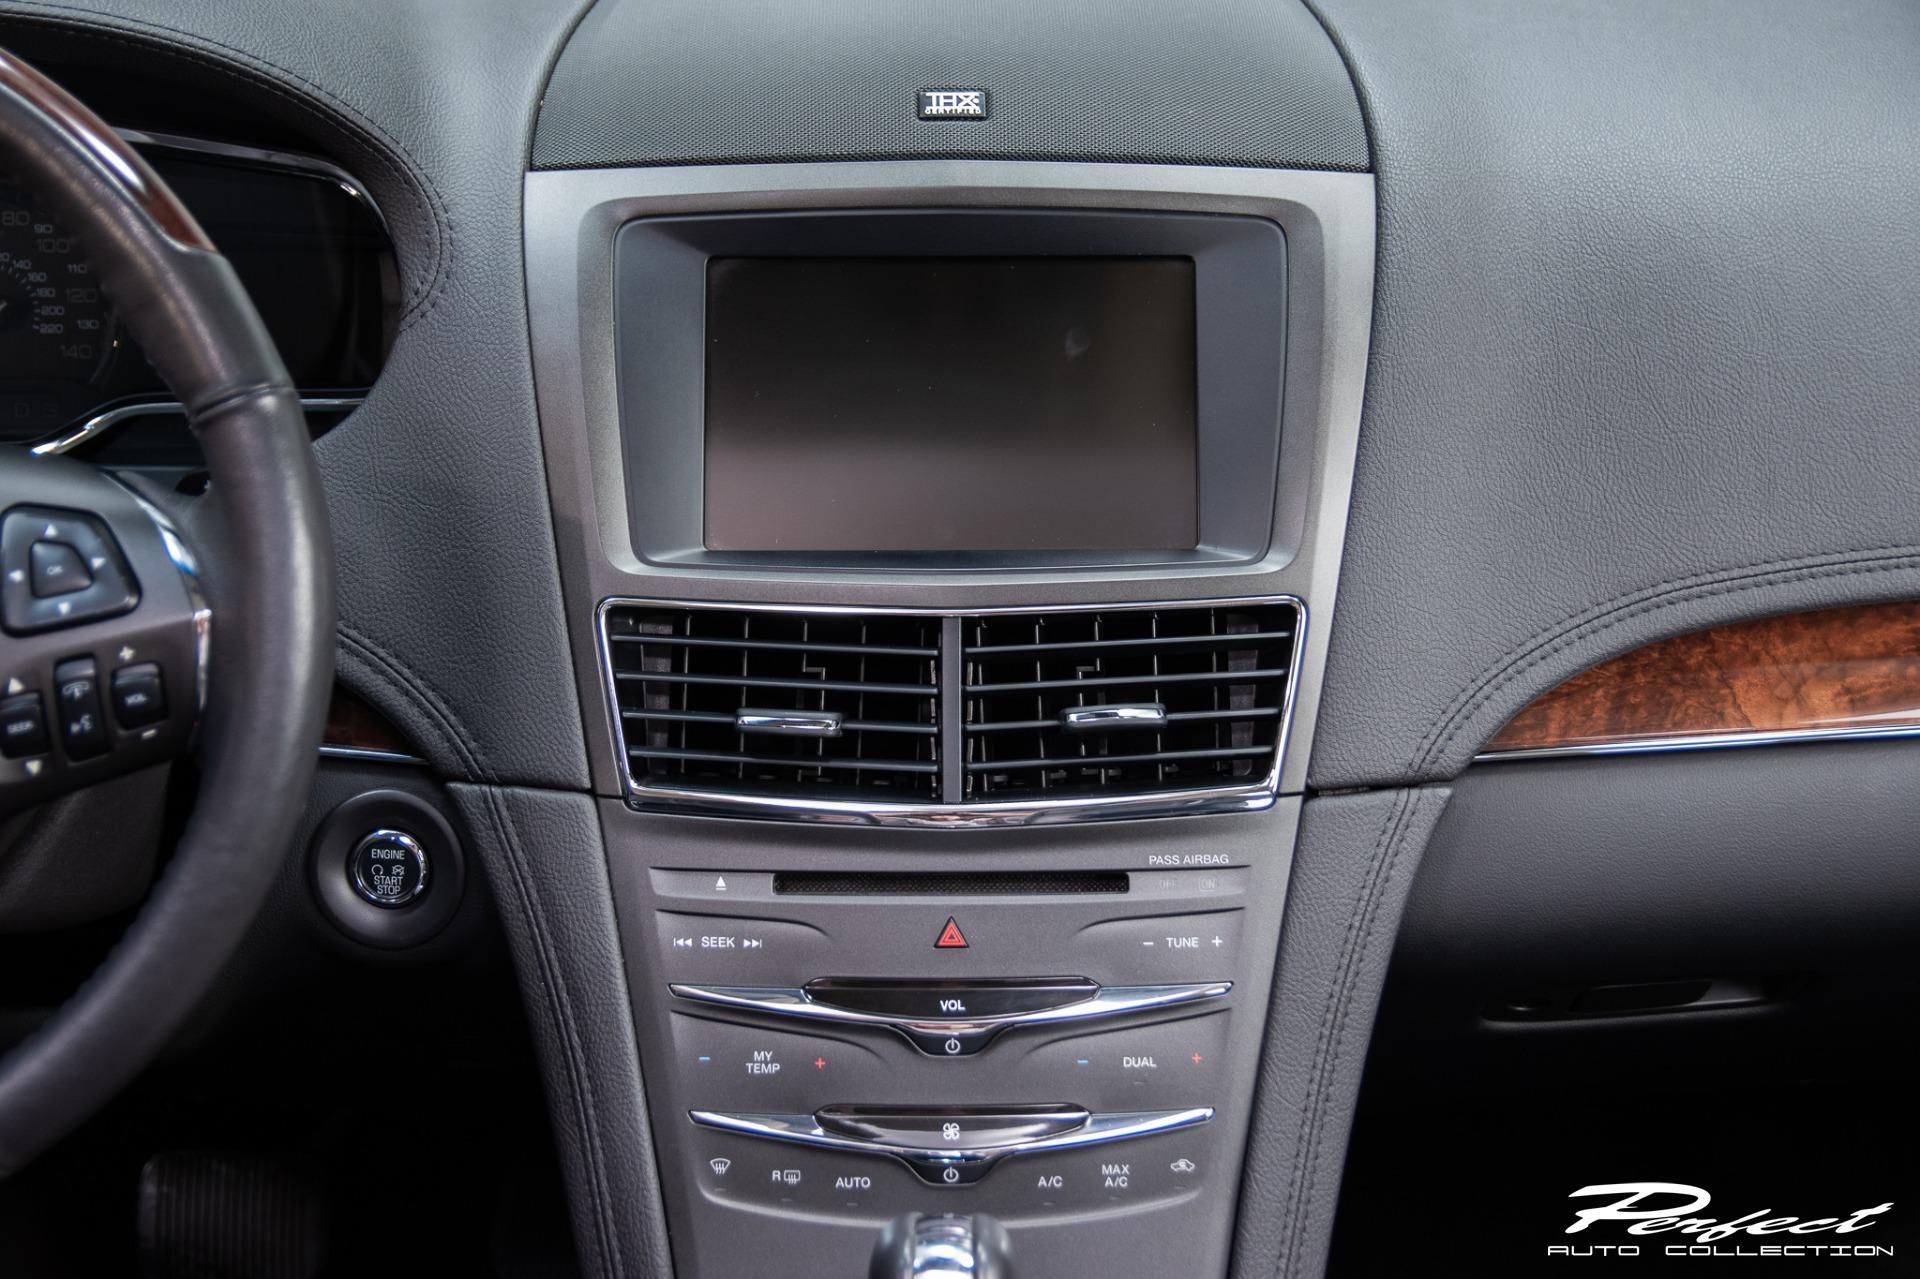 Used 2013 Lincoln MKT EcoBoost